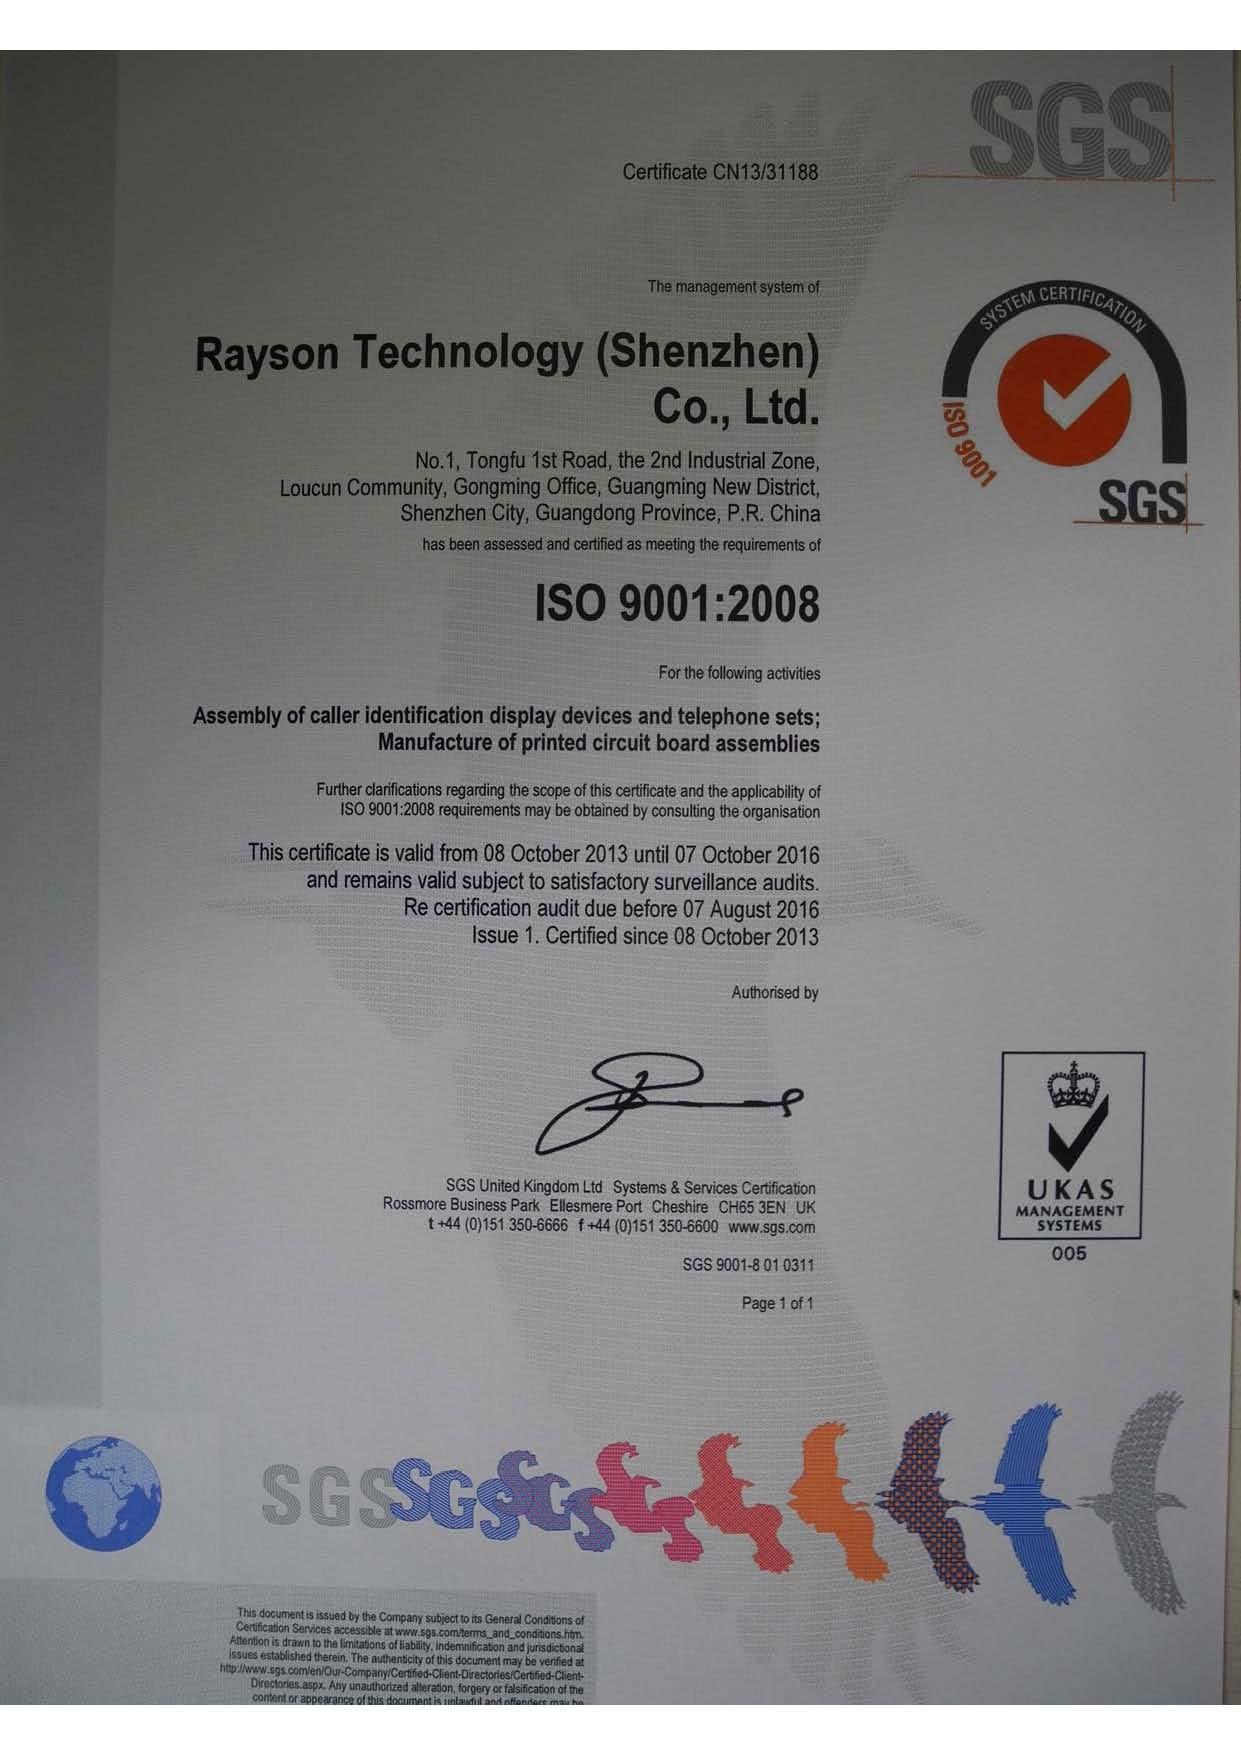 Rayson Technology Co,Ltd - Quality